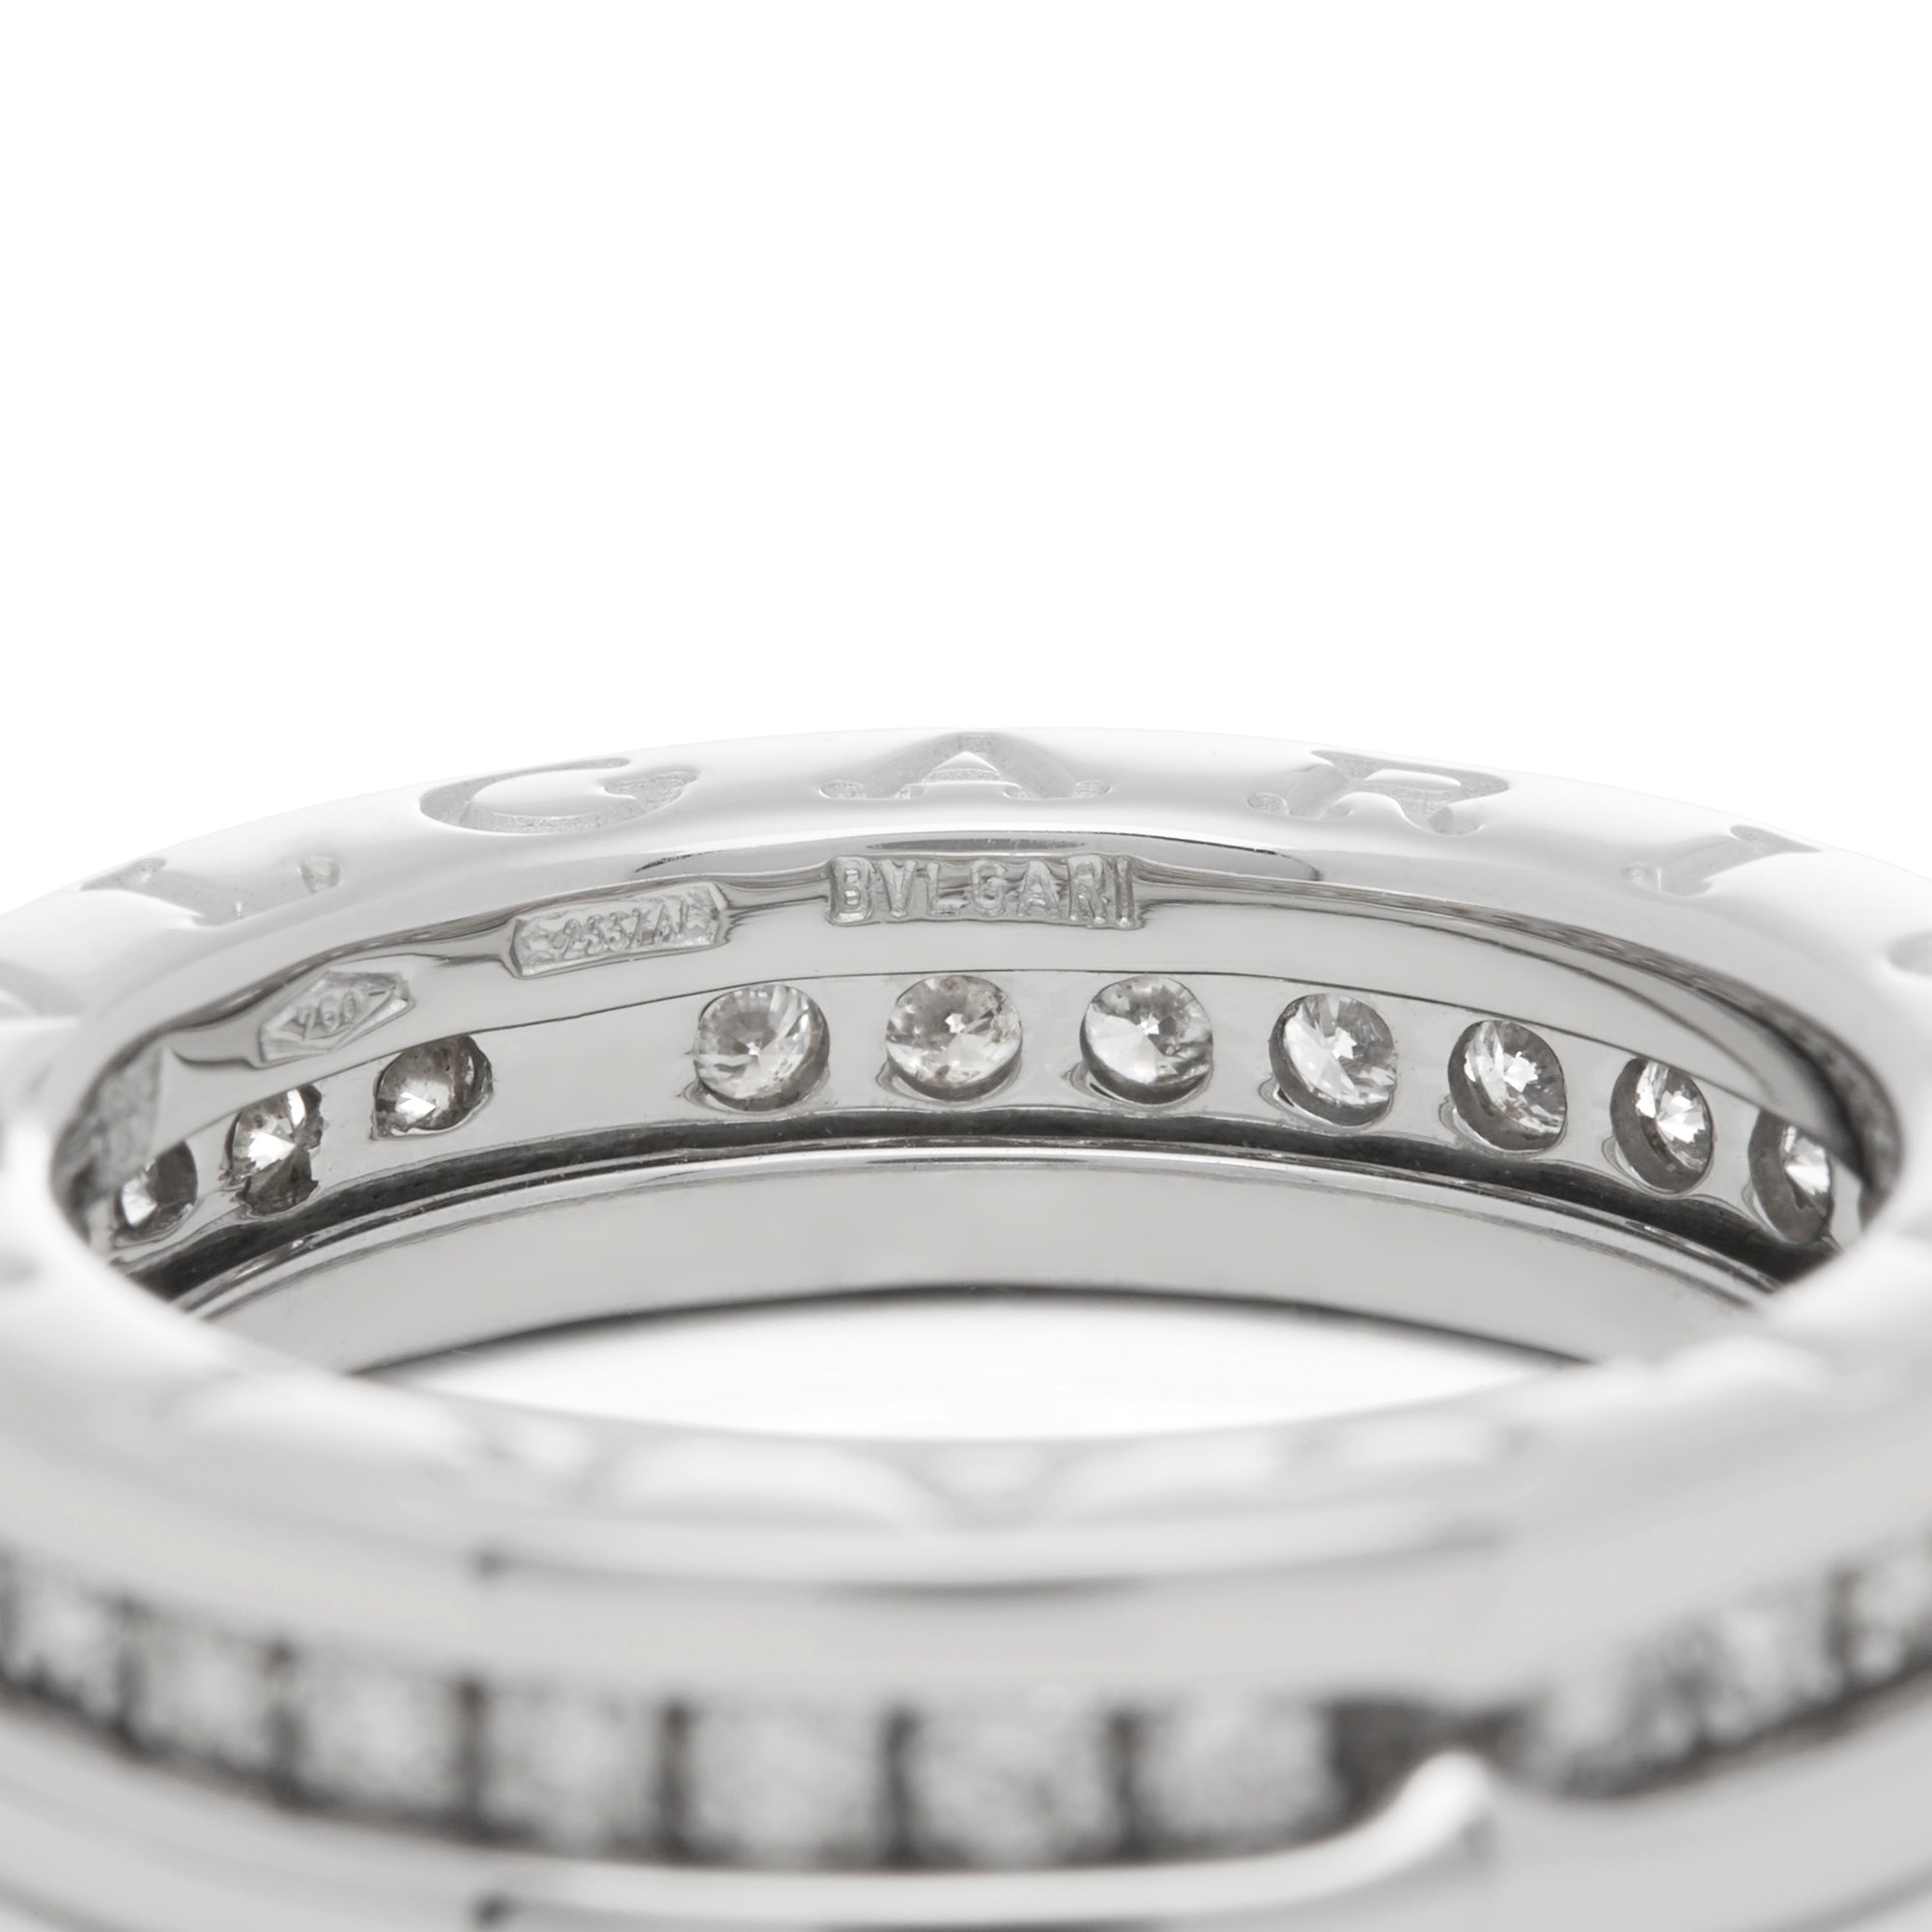 Bulgari 18k White Gold B.Zero 1 Ring